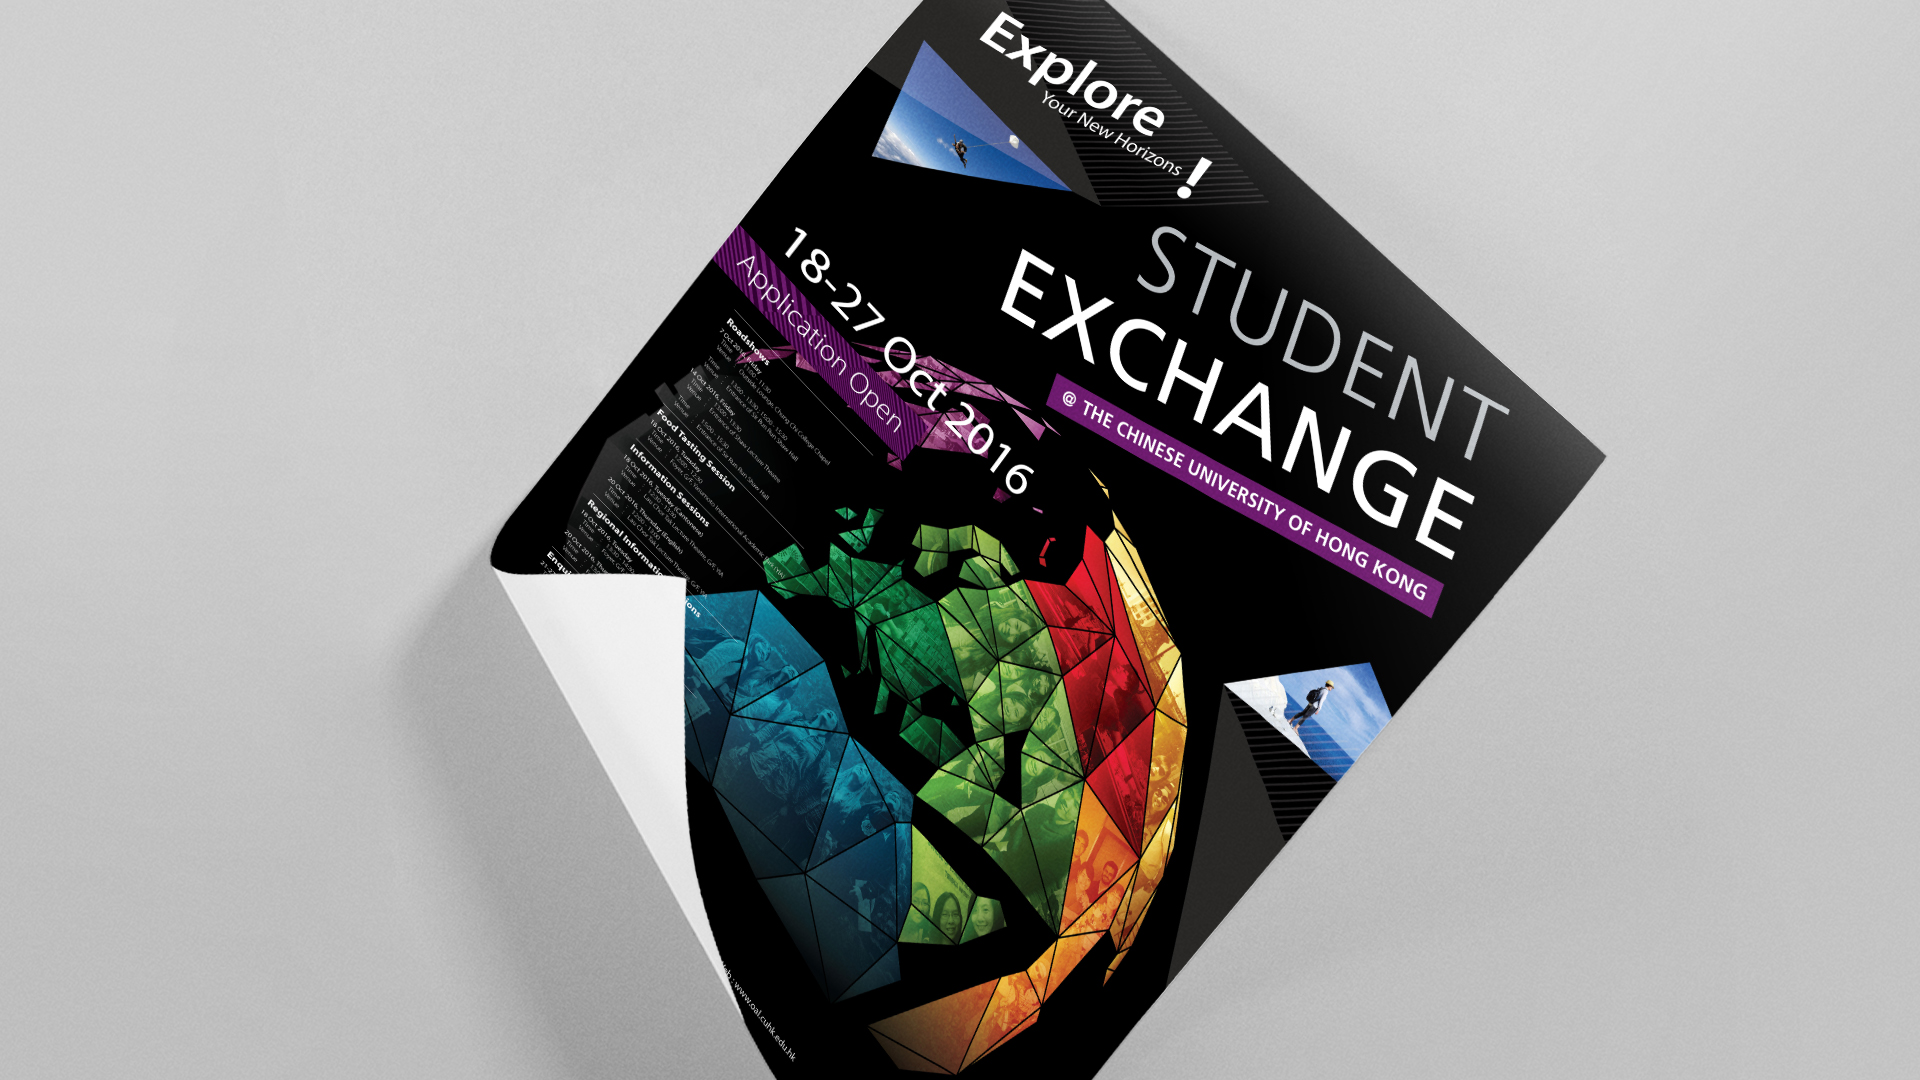 CUHK OAL Student Exchange Programmes